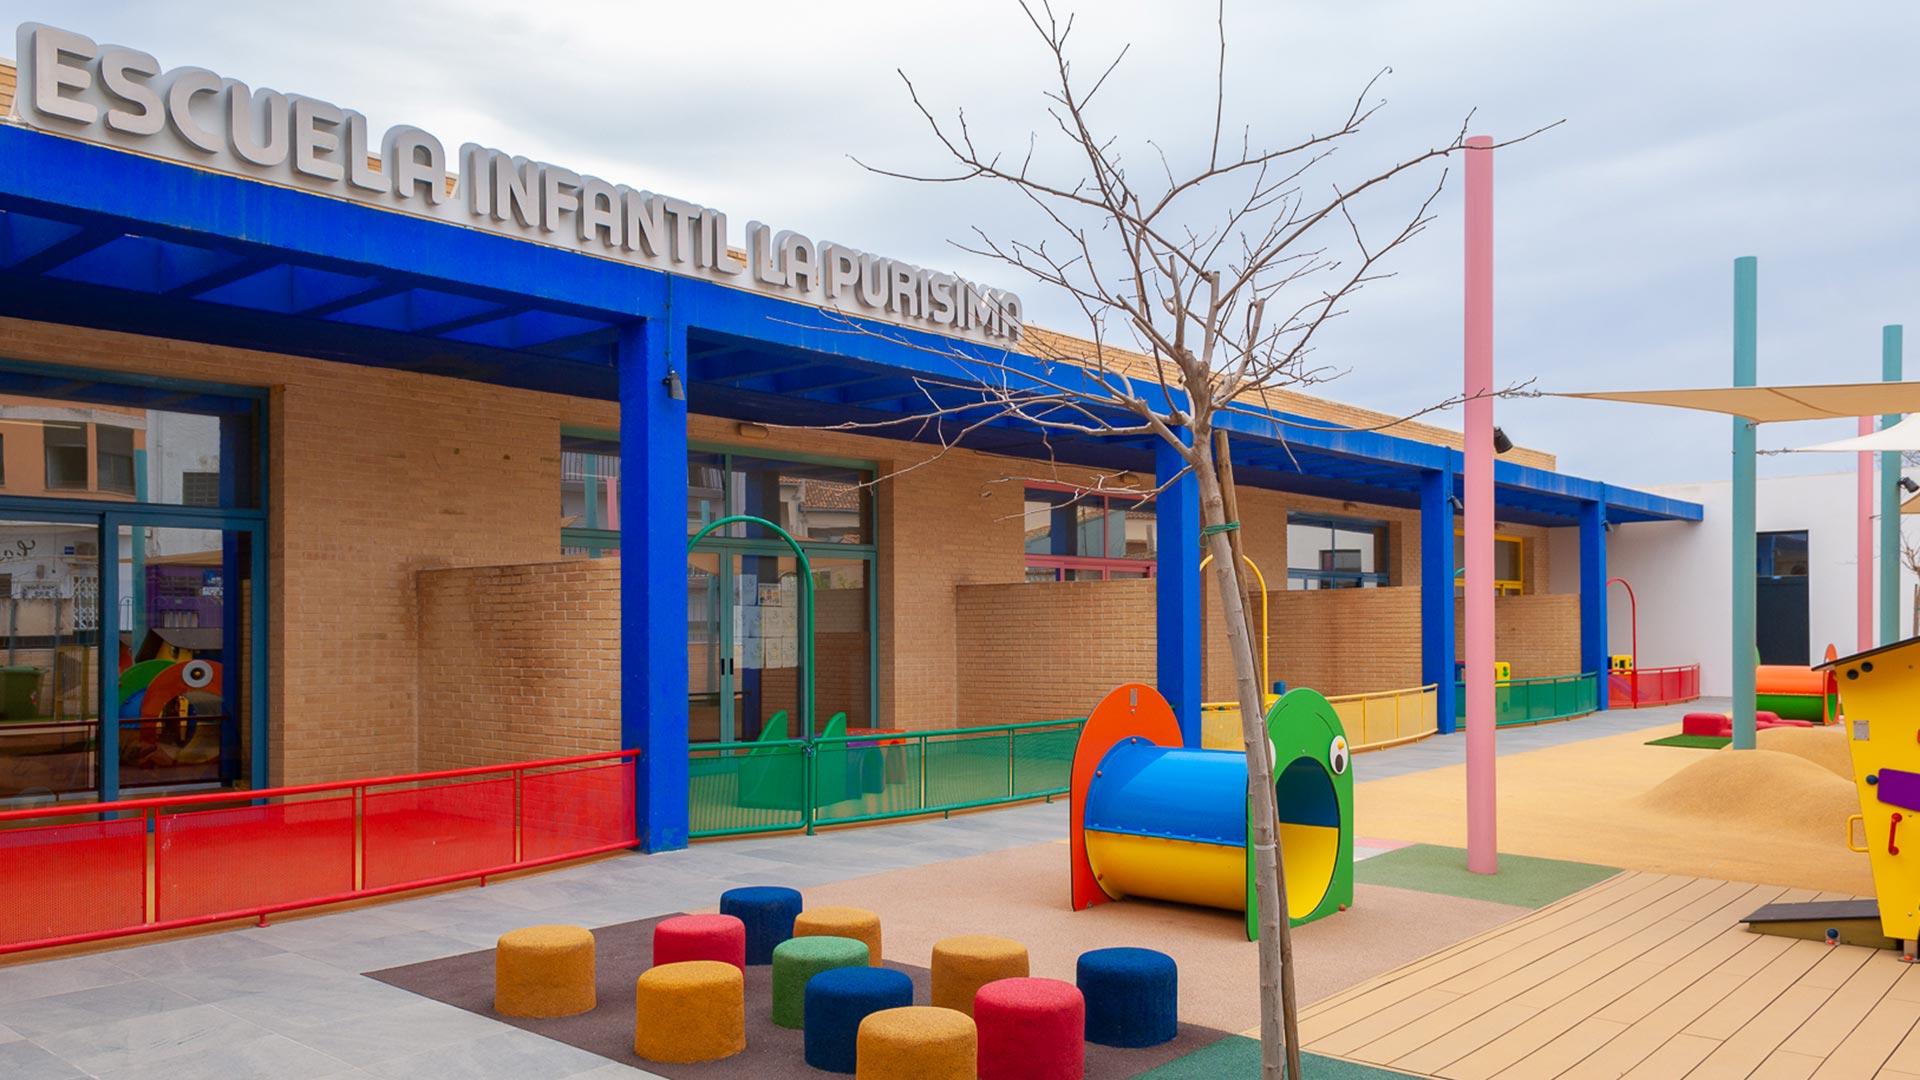 Escuela Infantil La Purissima Benissa